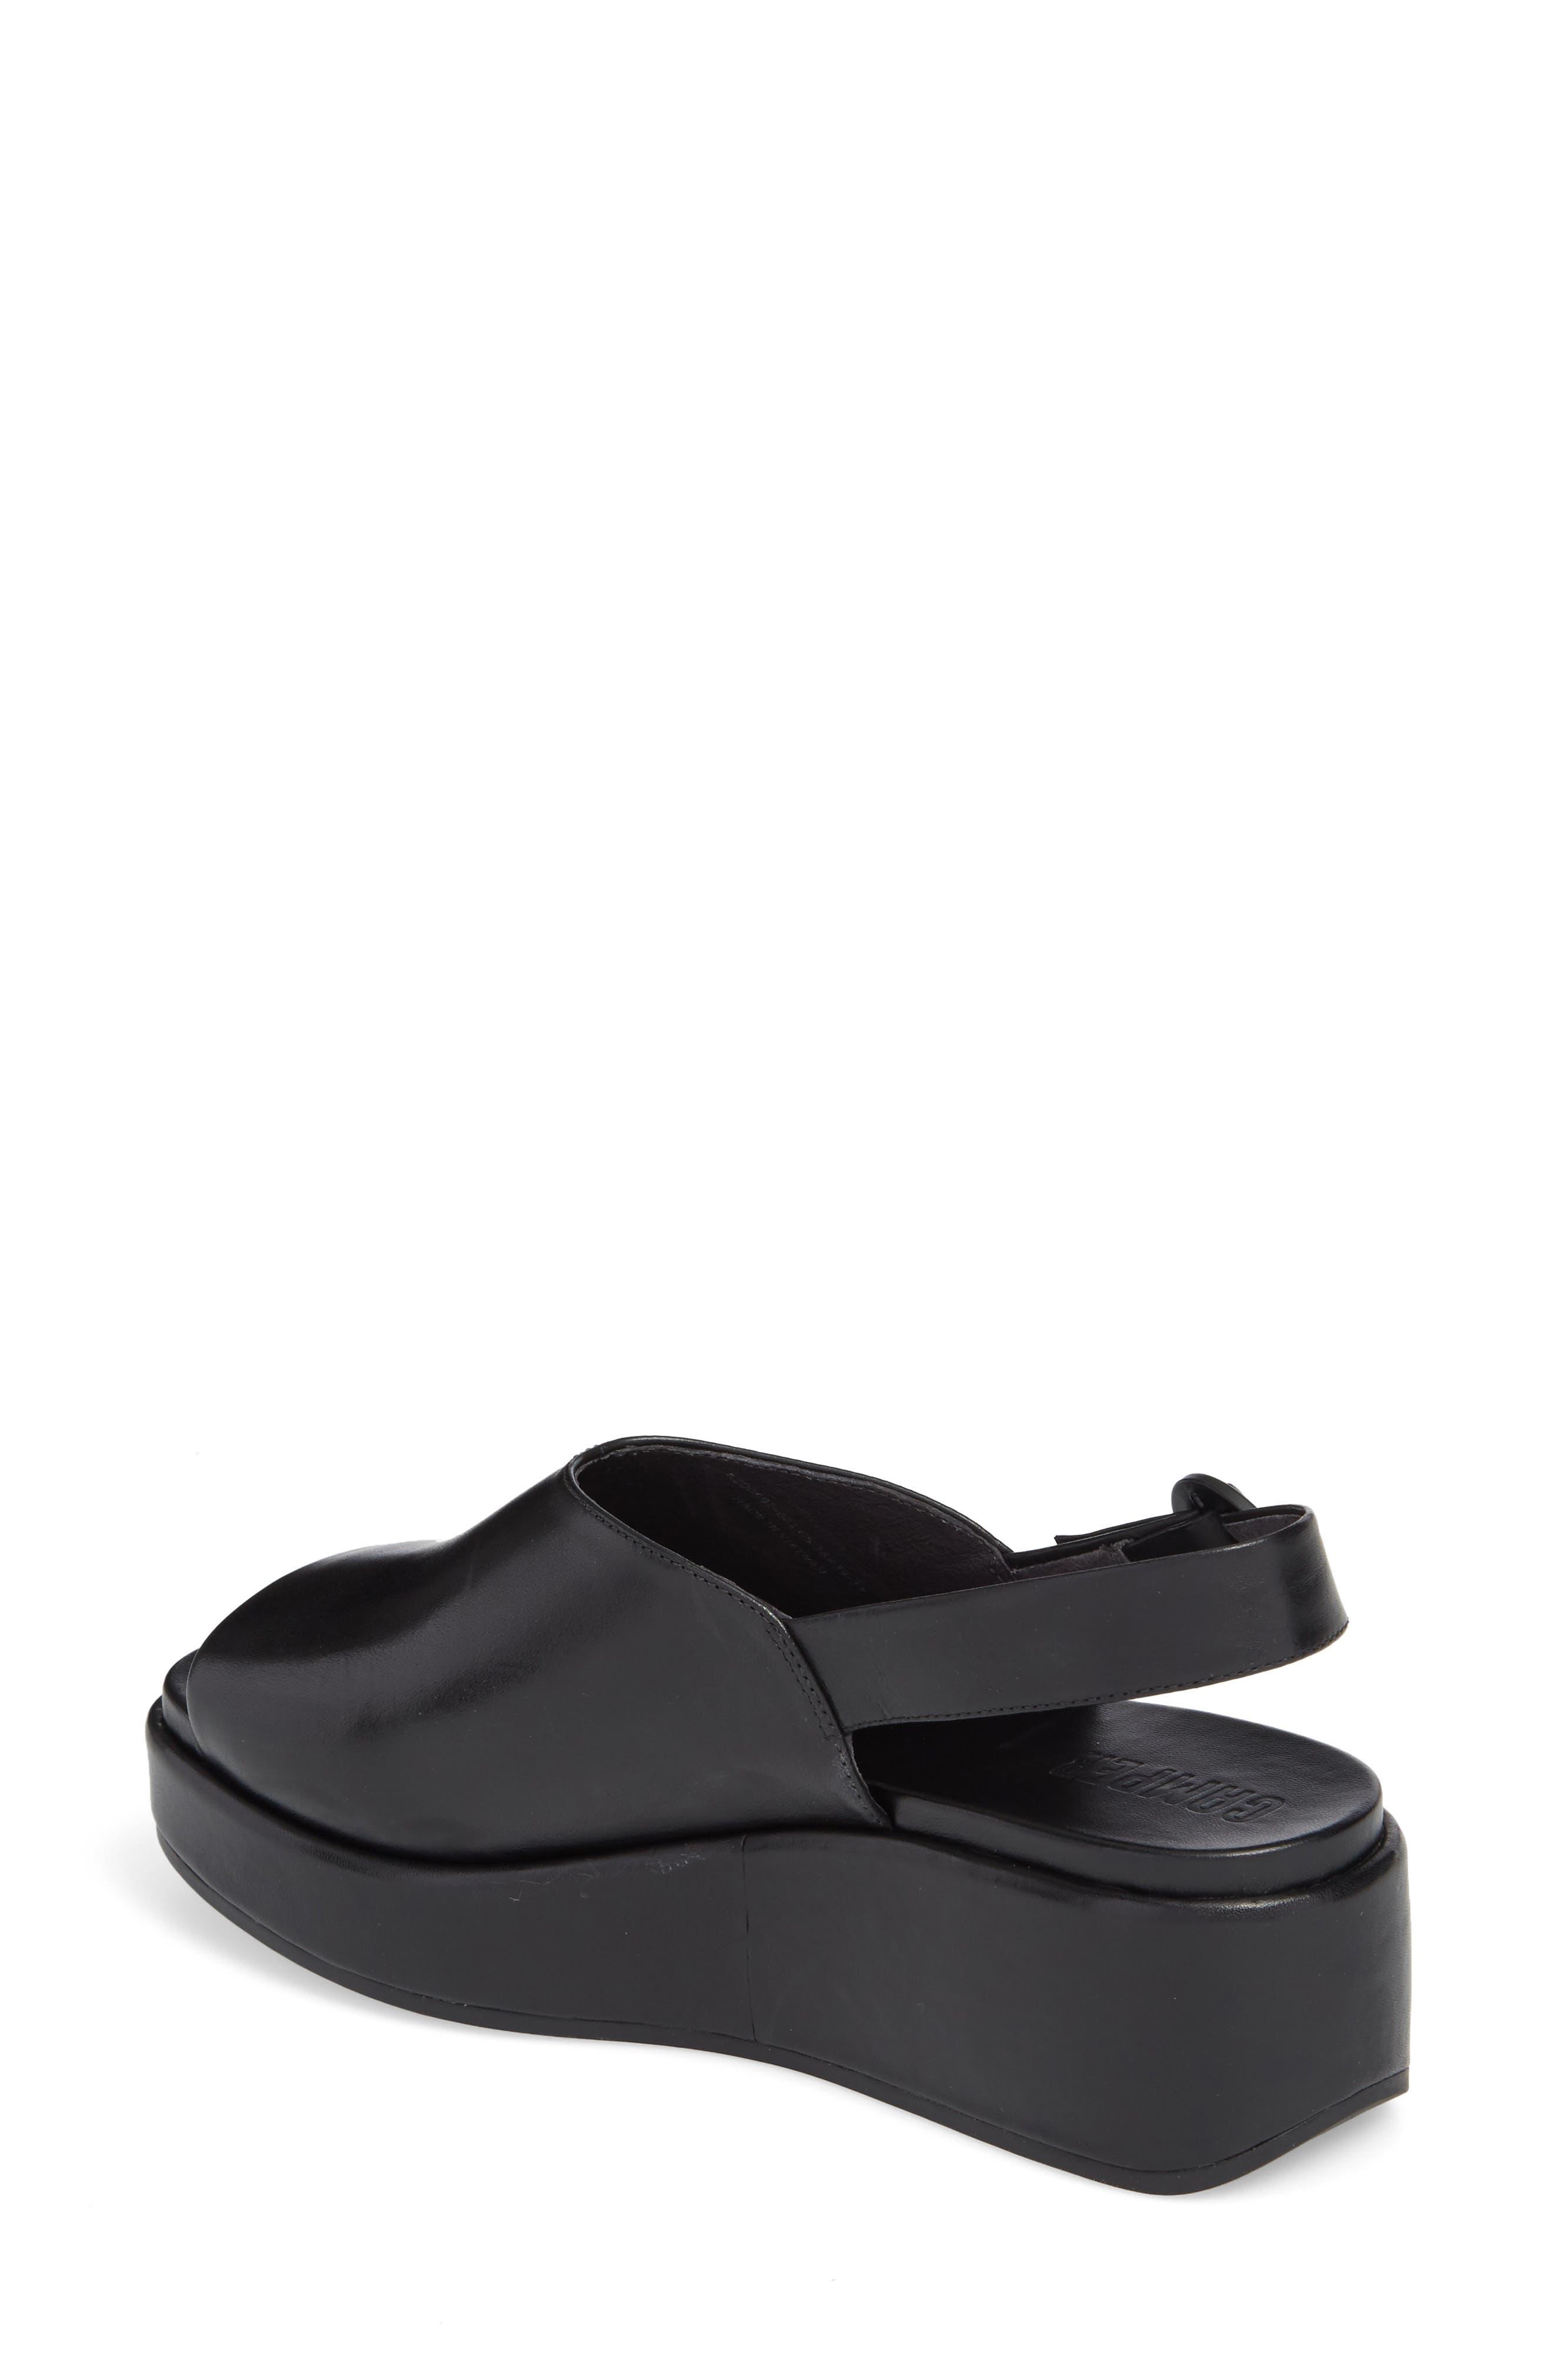 Misia Slingback Platform Wedge Sandal,                             Alternate thumbnail 2, color,                             Black Leather